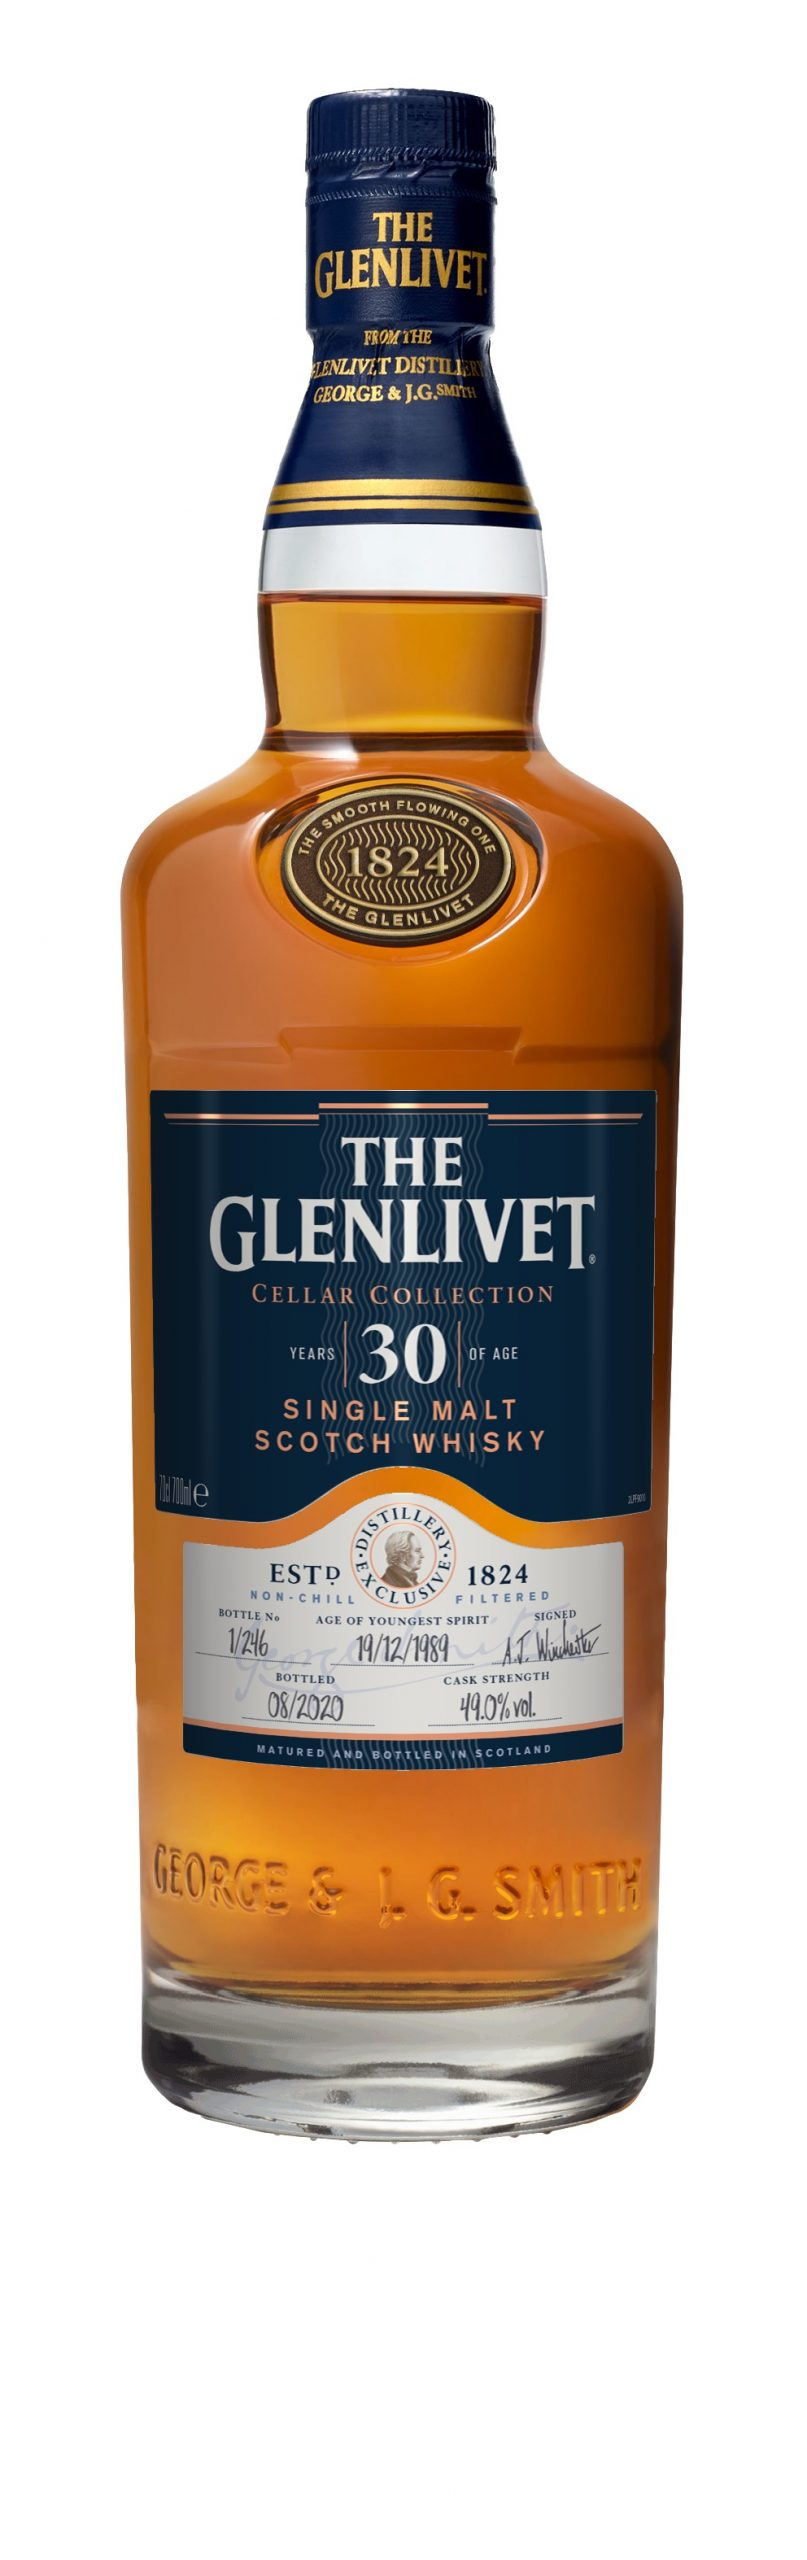 The Glenlivet Cellar Collection 30YO